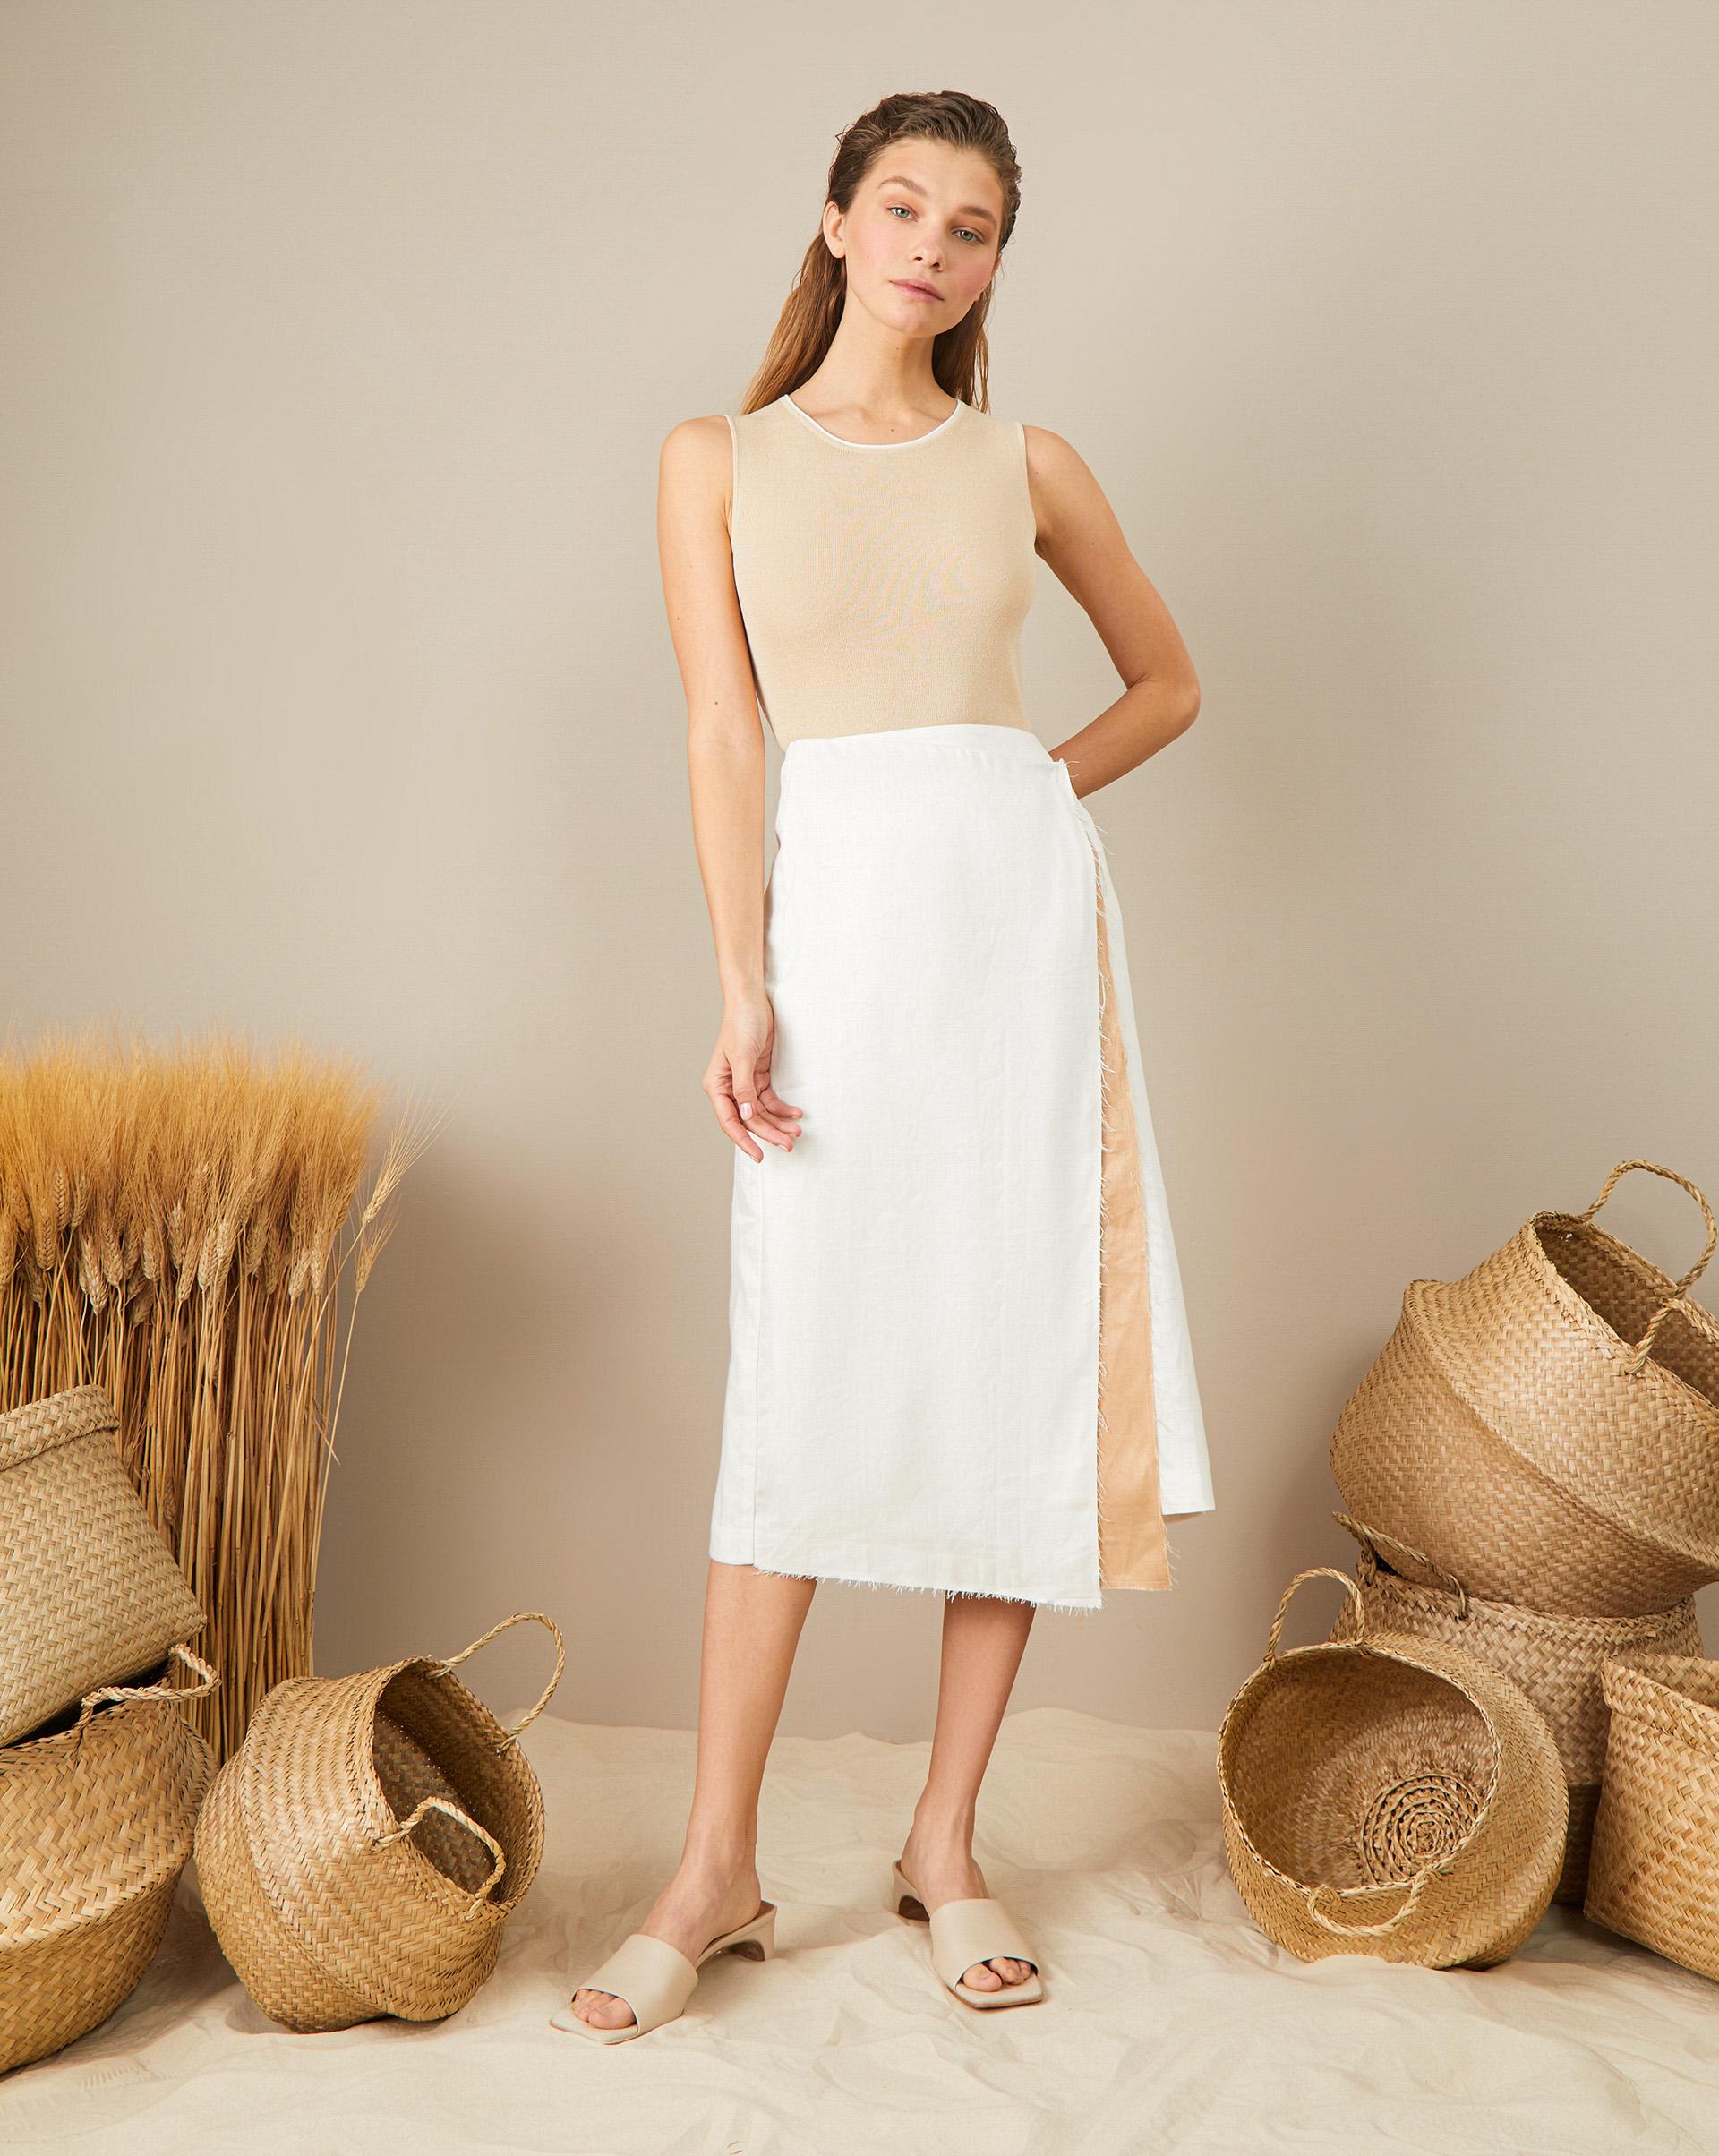 Фото - 12Storeez Ассиметричная юбка юбка из полиамида